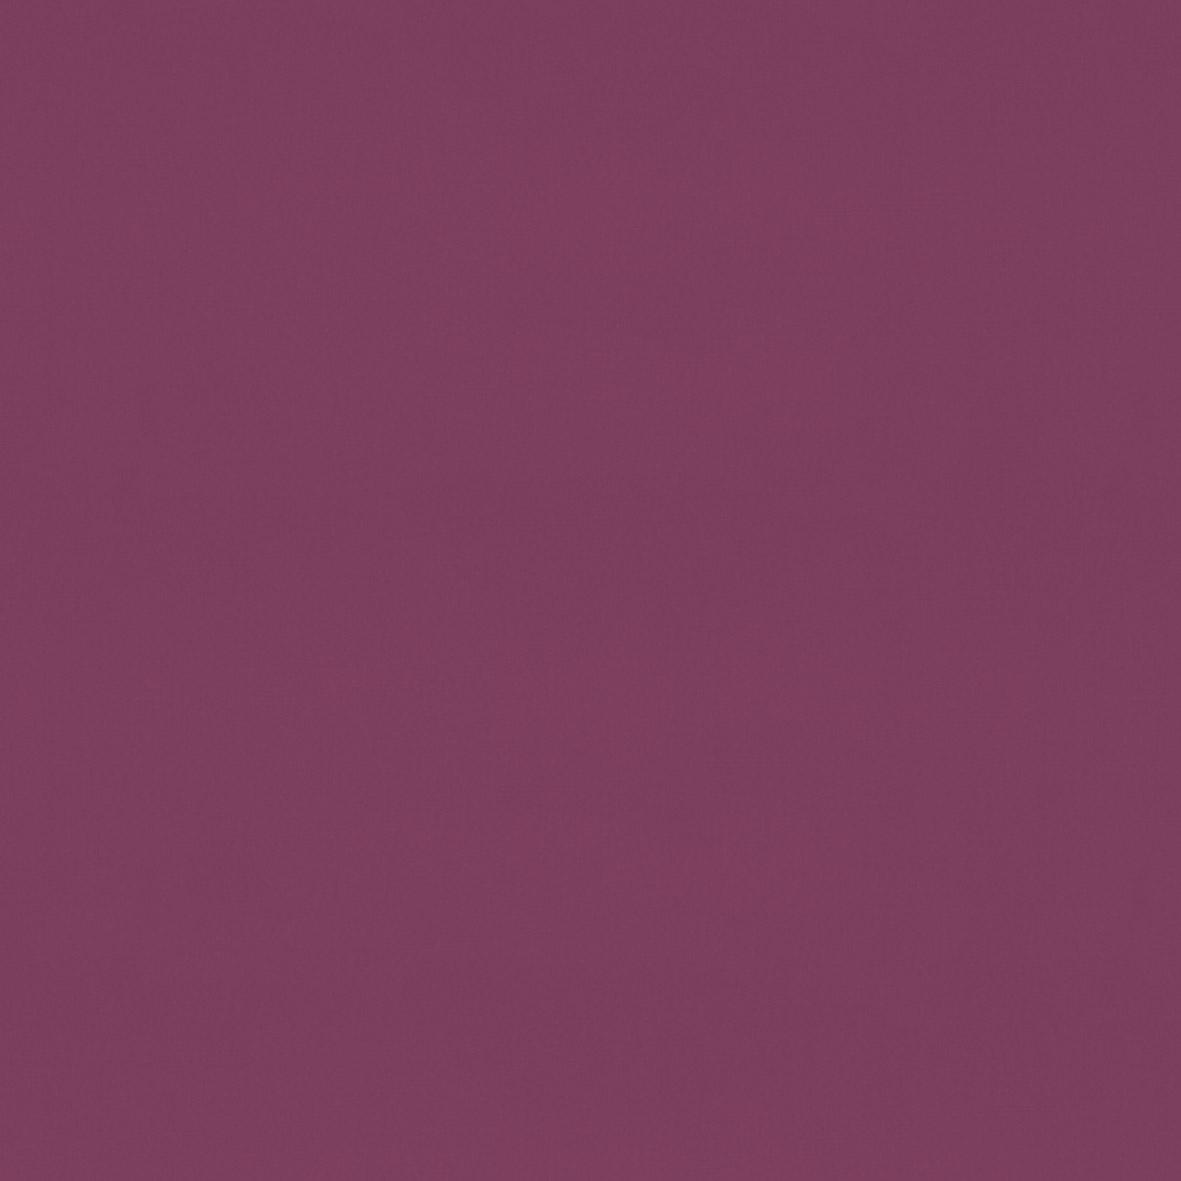 Roller_Swatch_Palette_Grape_RE0086